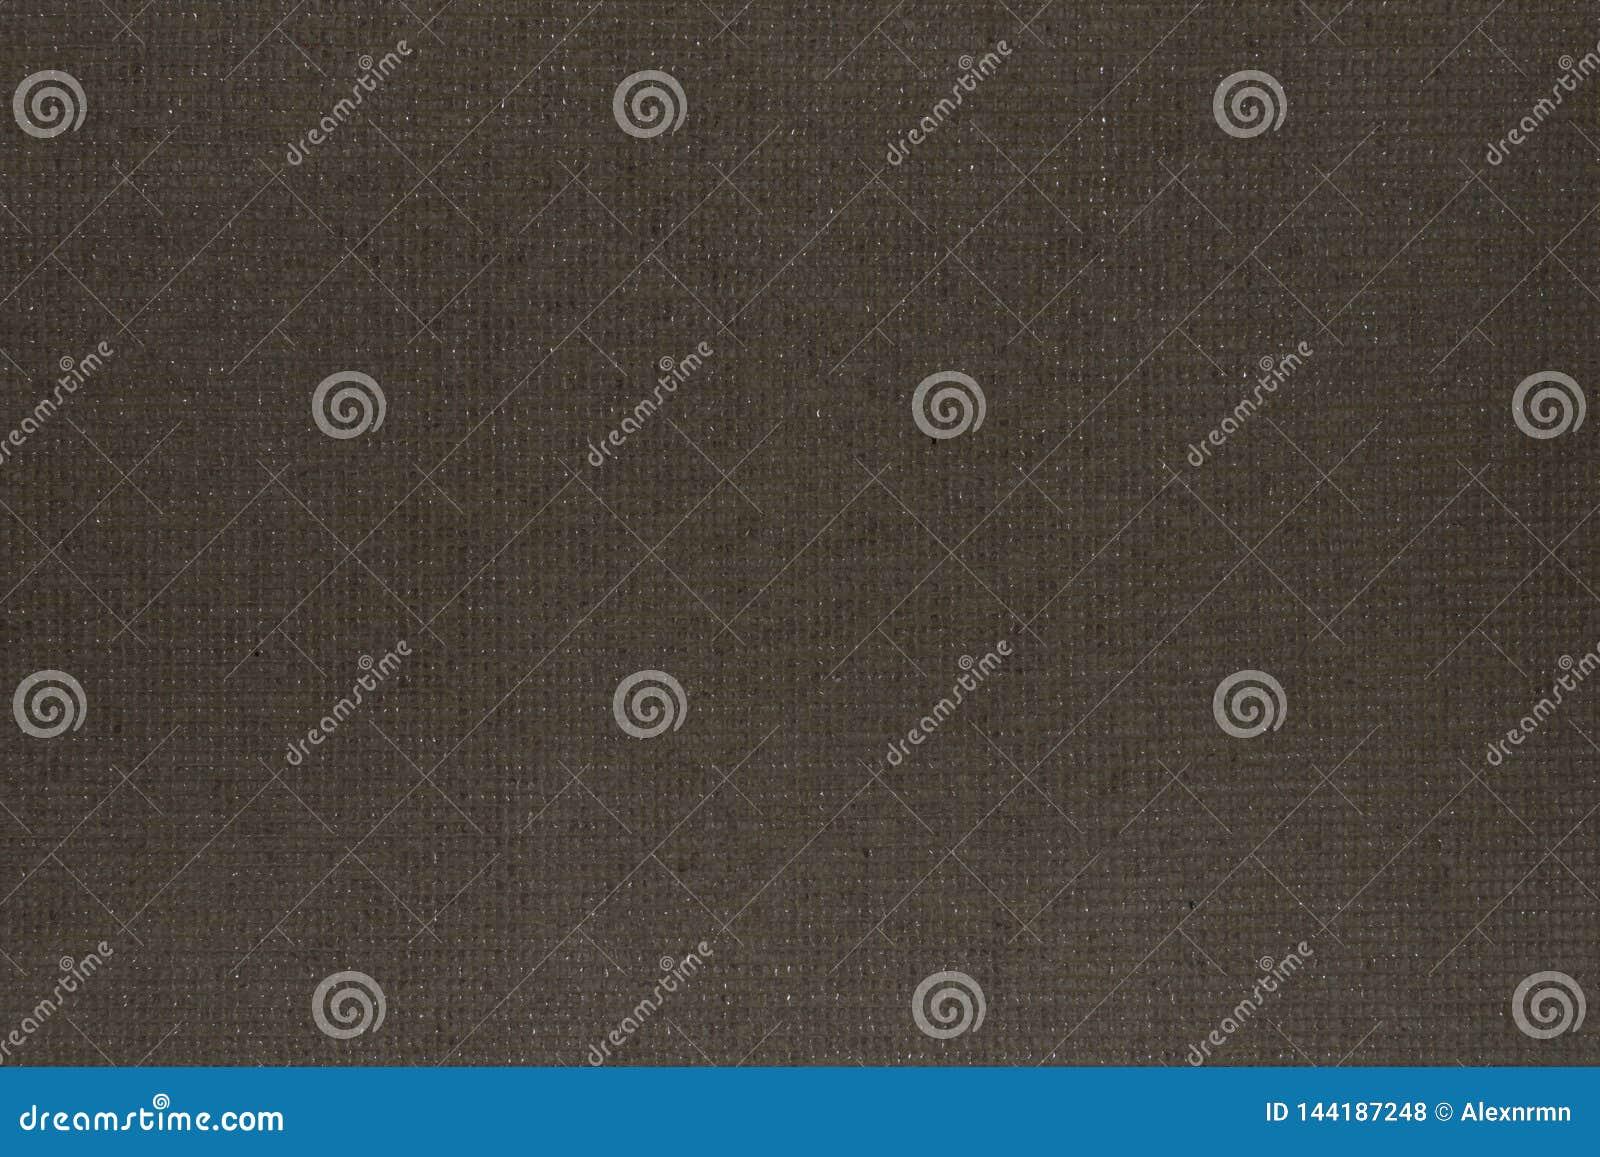 Fondo, textura de la base de la alfombra